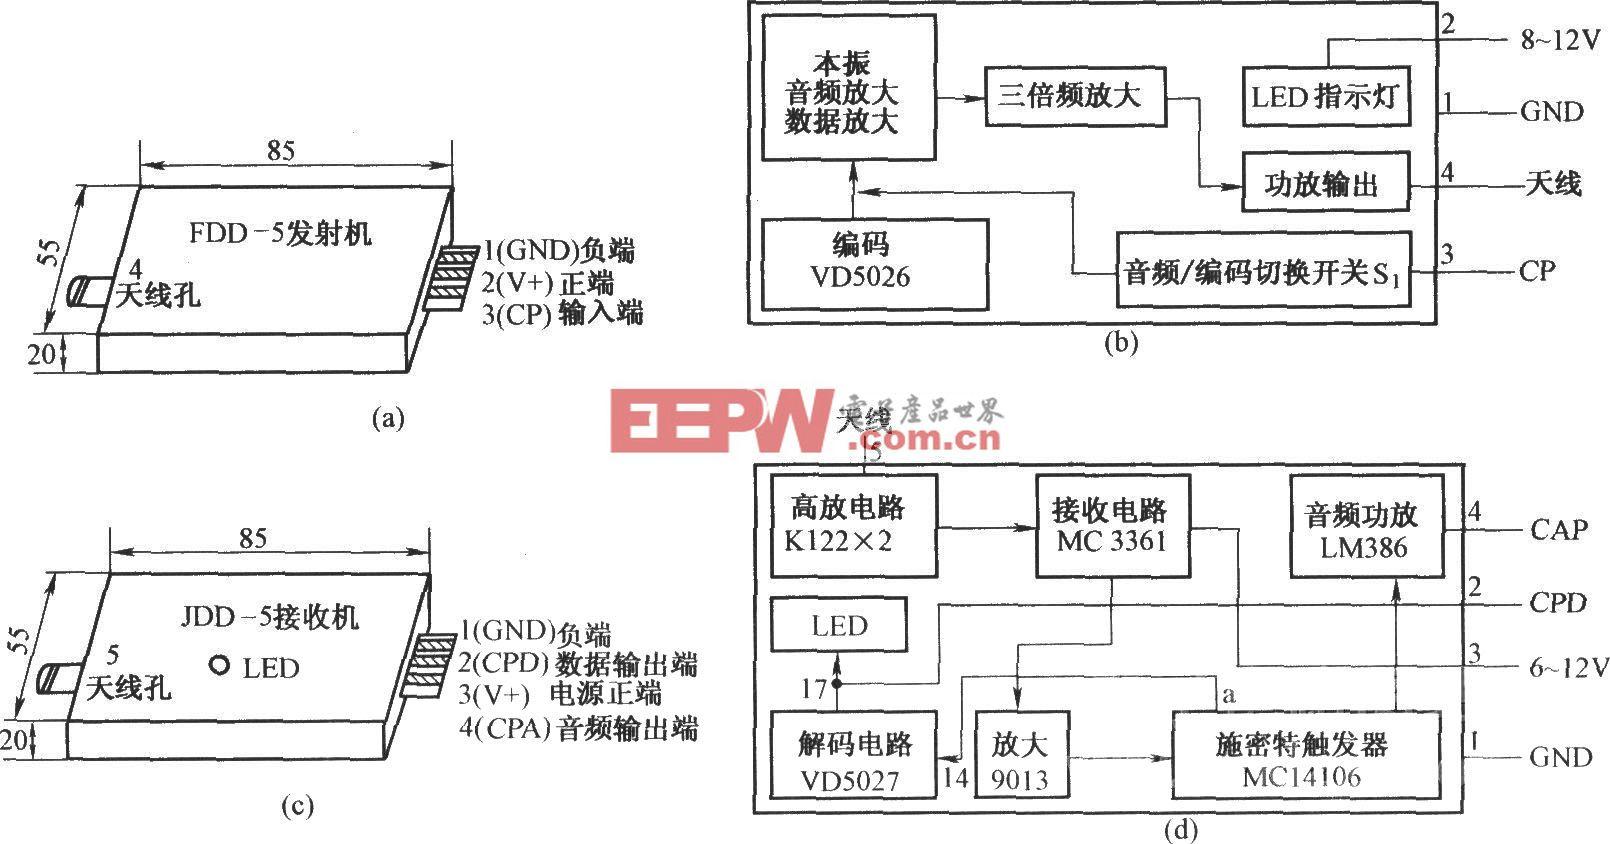 FDD-5/JDD-5外形及内电路